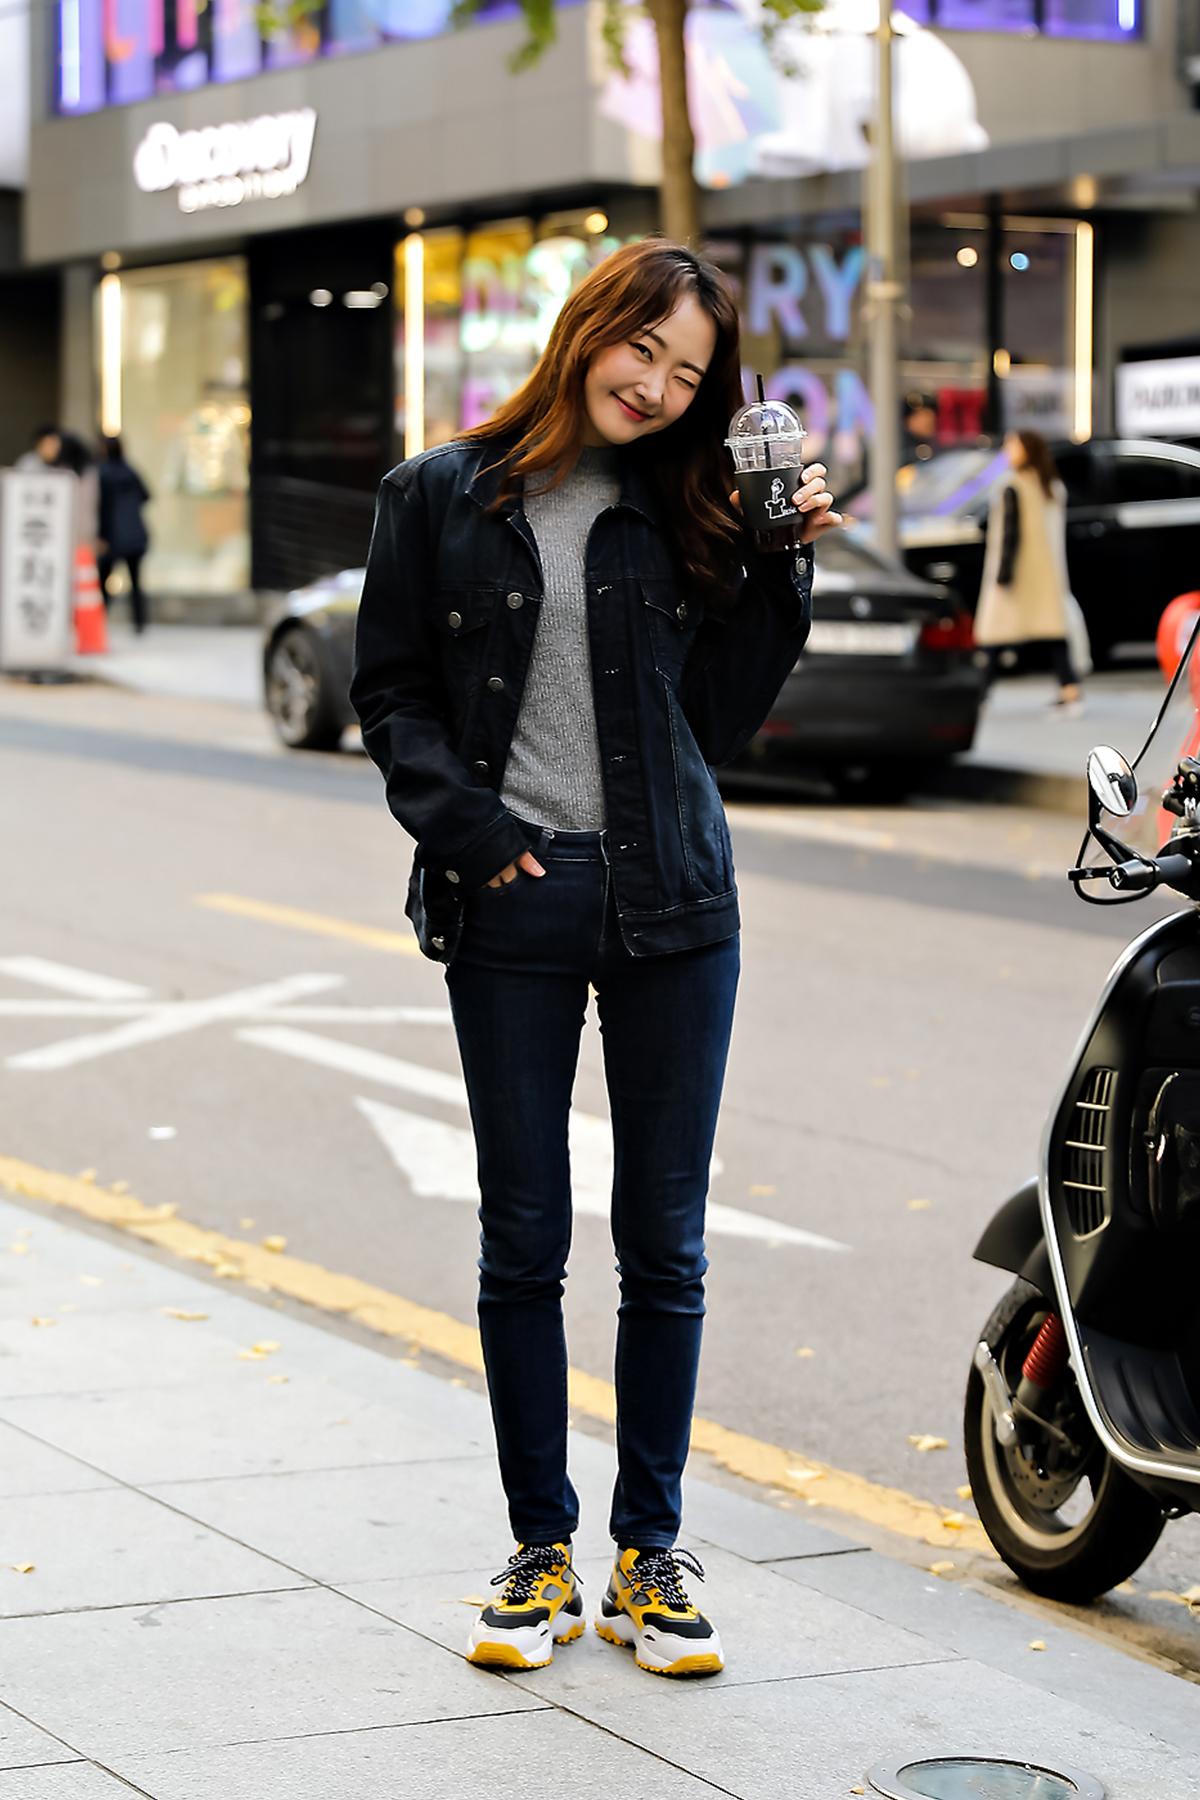 Women fall street style last week of october 2018 inseoul